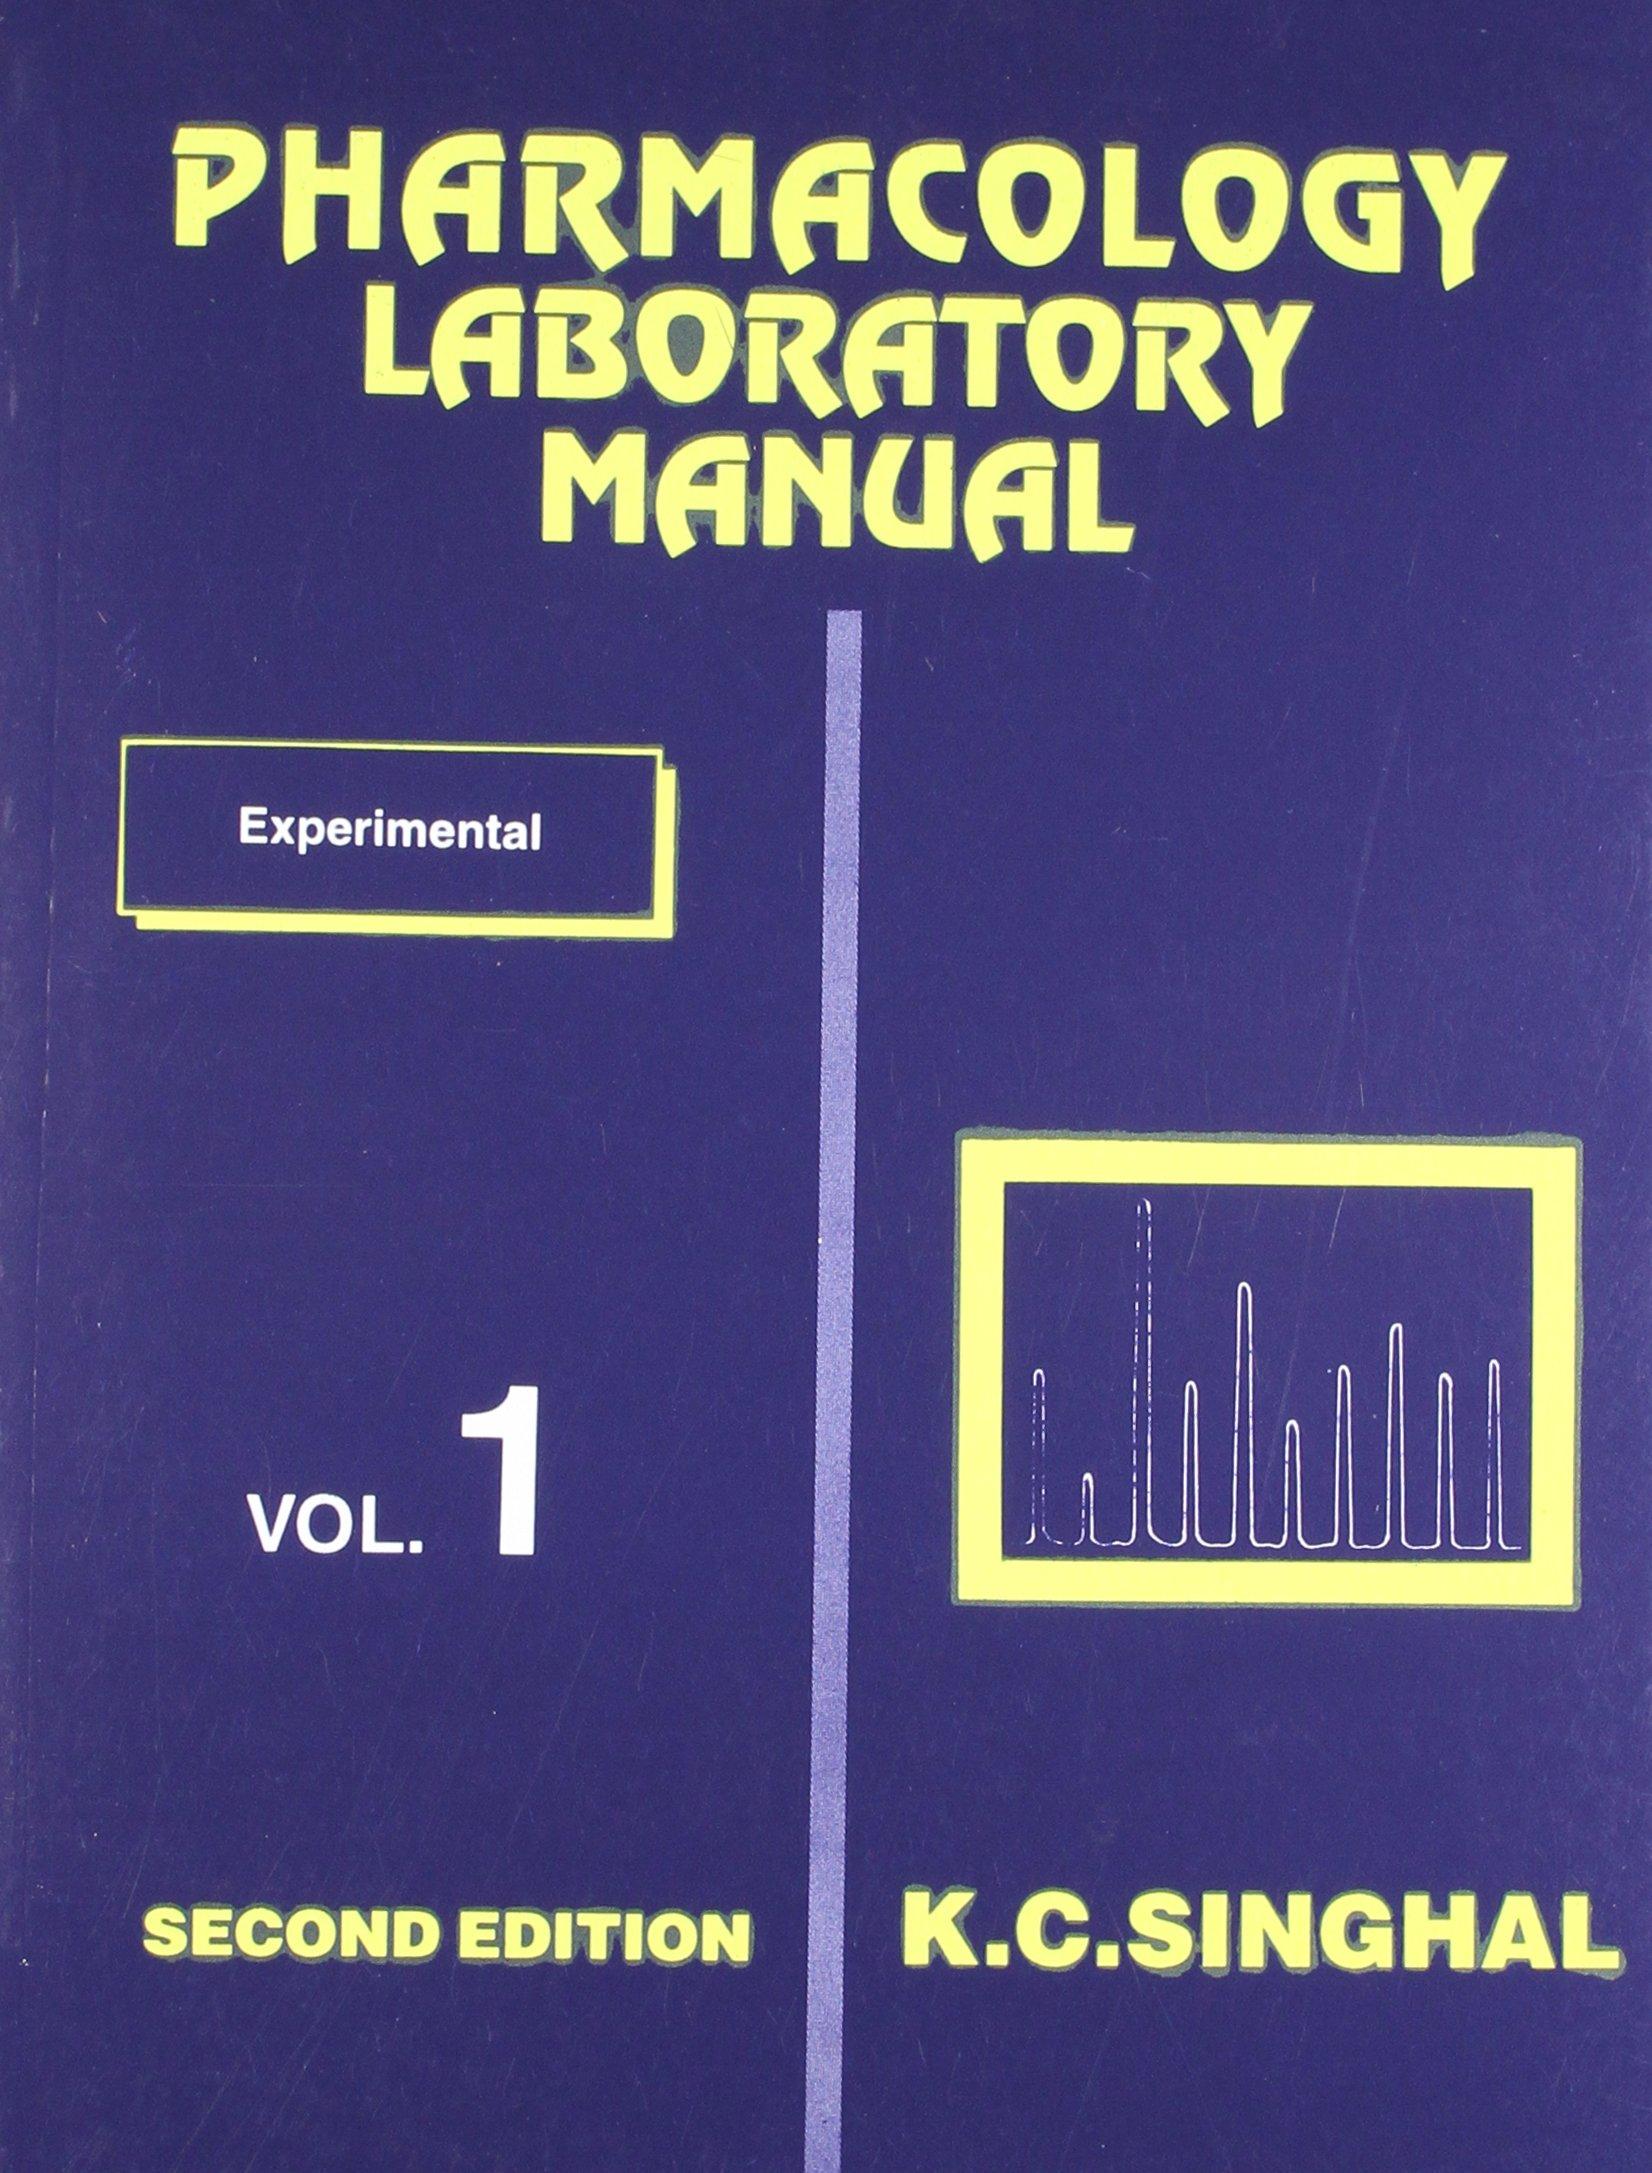 Pharmacology Laboratory Manual: v. 1: Experimental: K.C. Singhal:  9788123905549: Amazon.com: Books